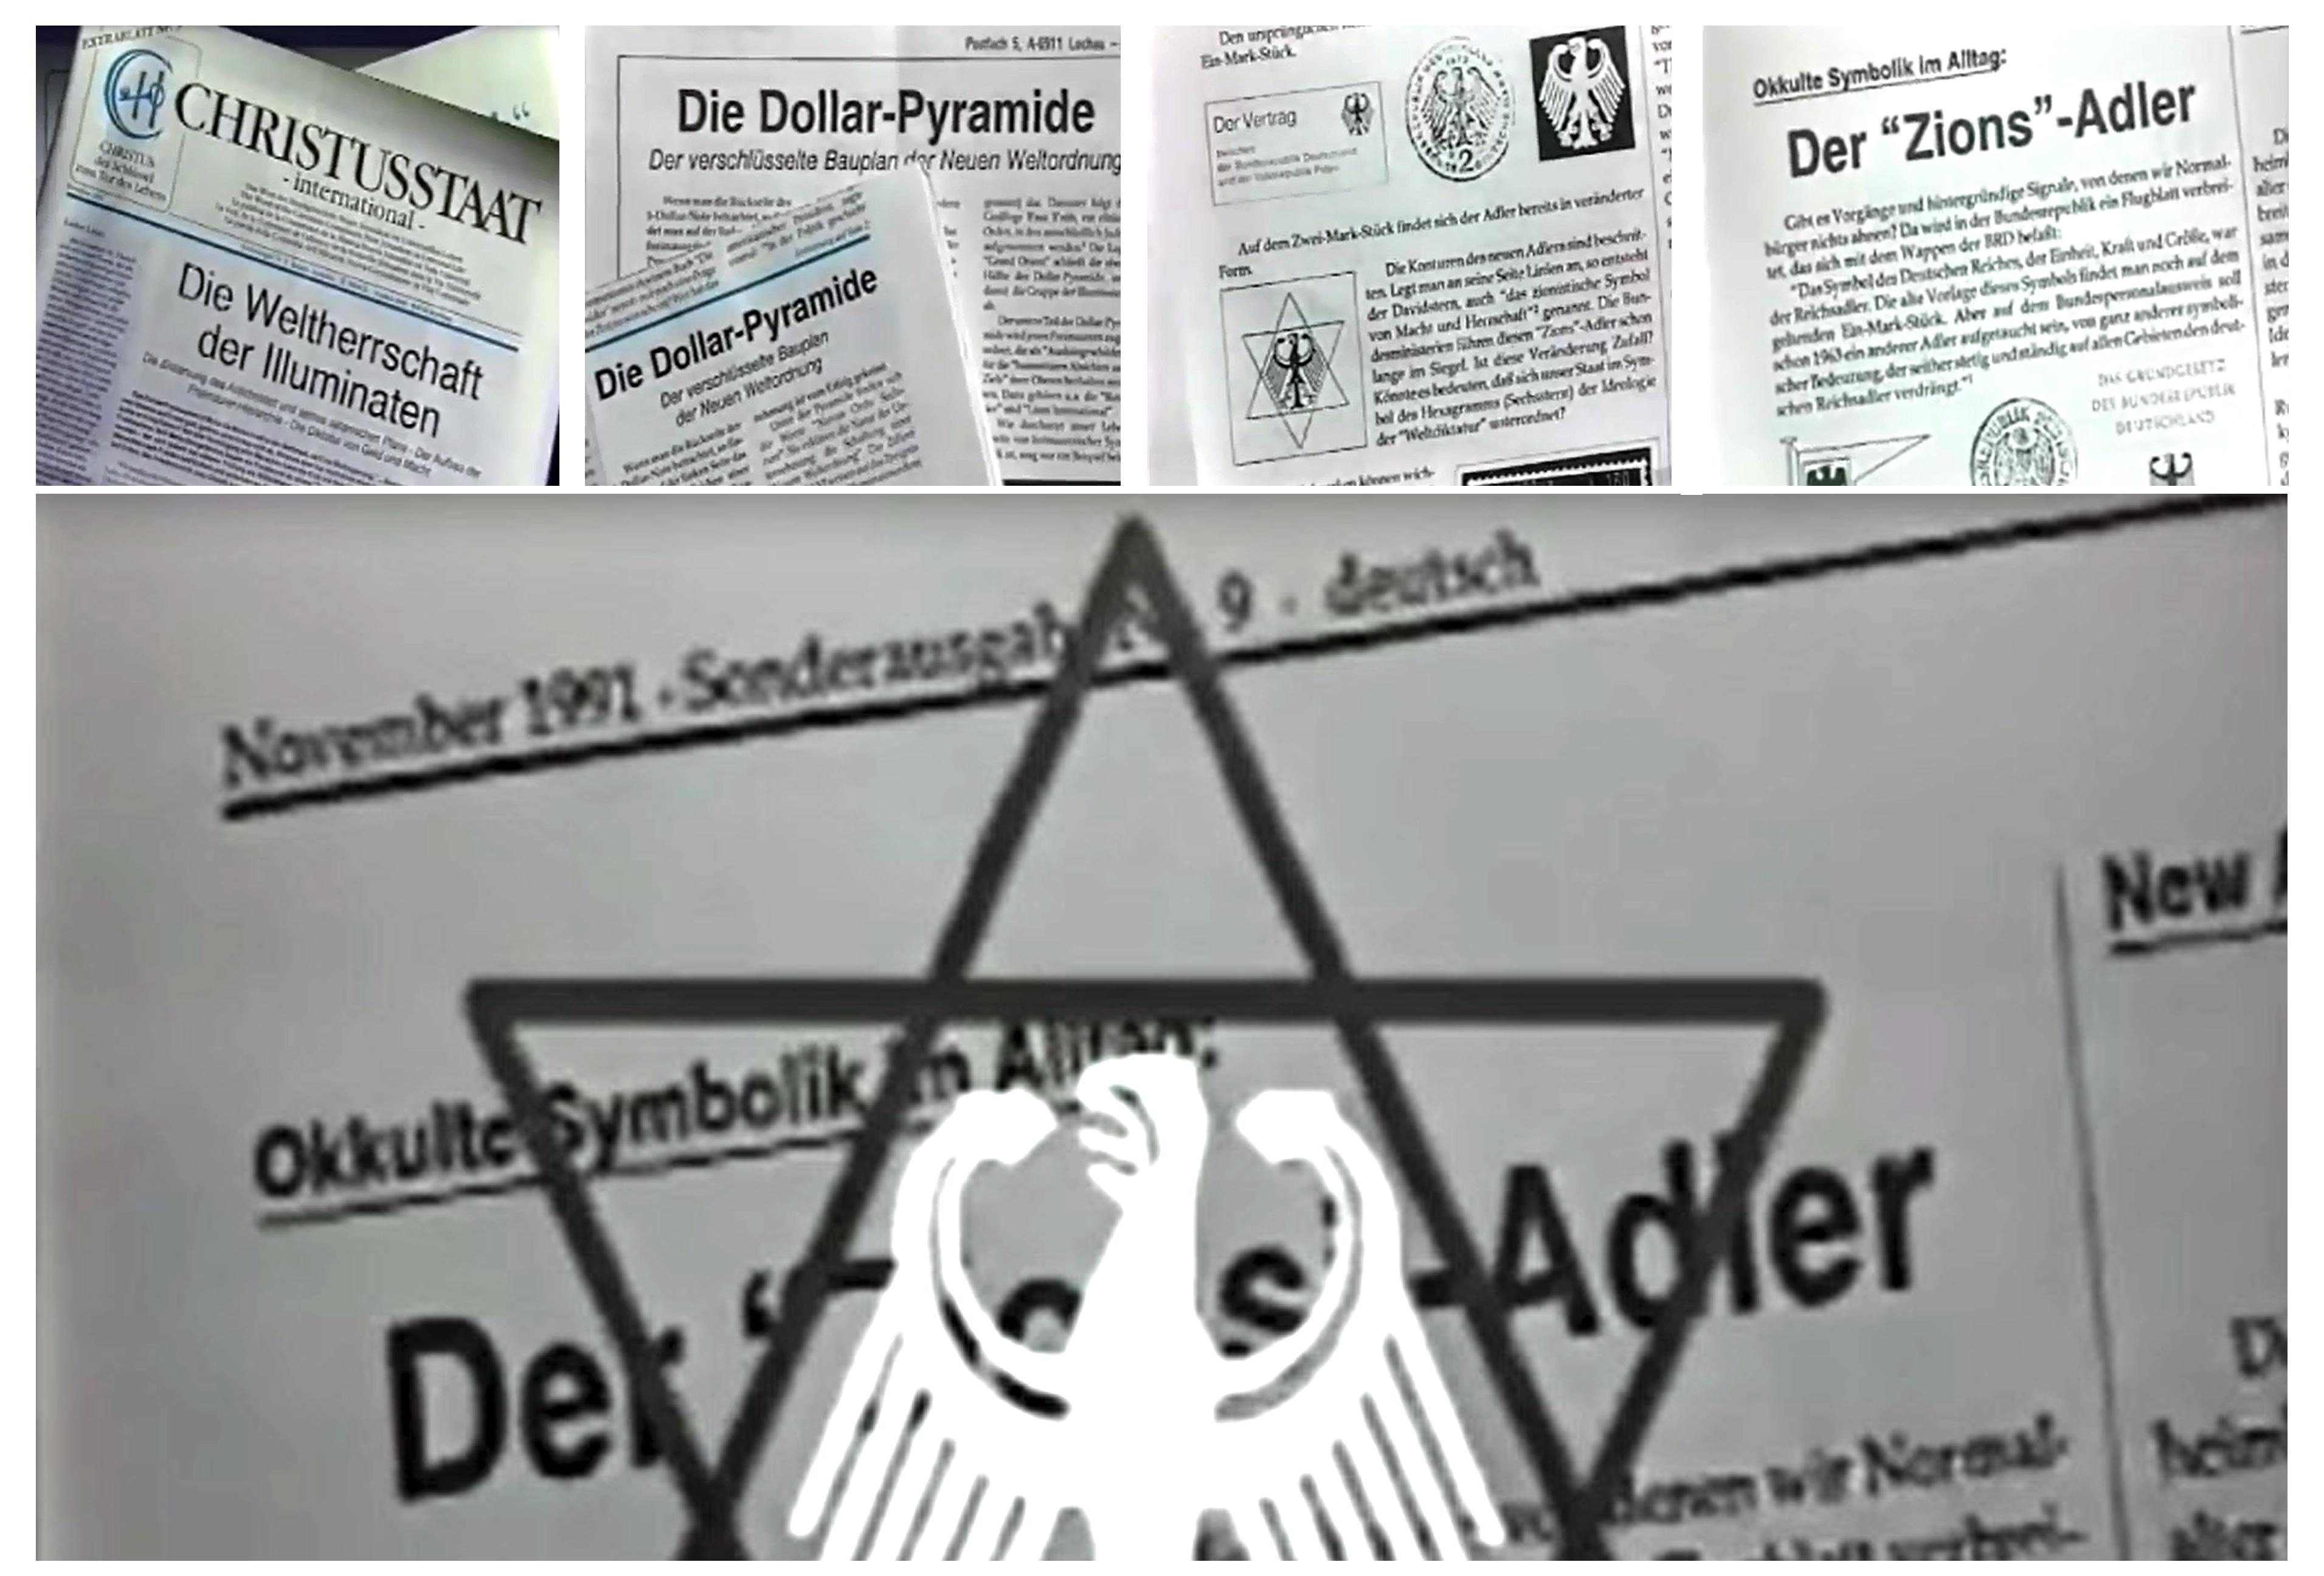 https://abload.de/img/antisemitismuschristu0rsv6.jpg